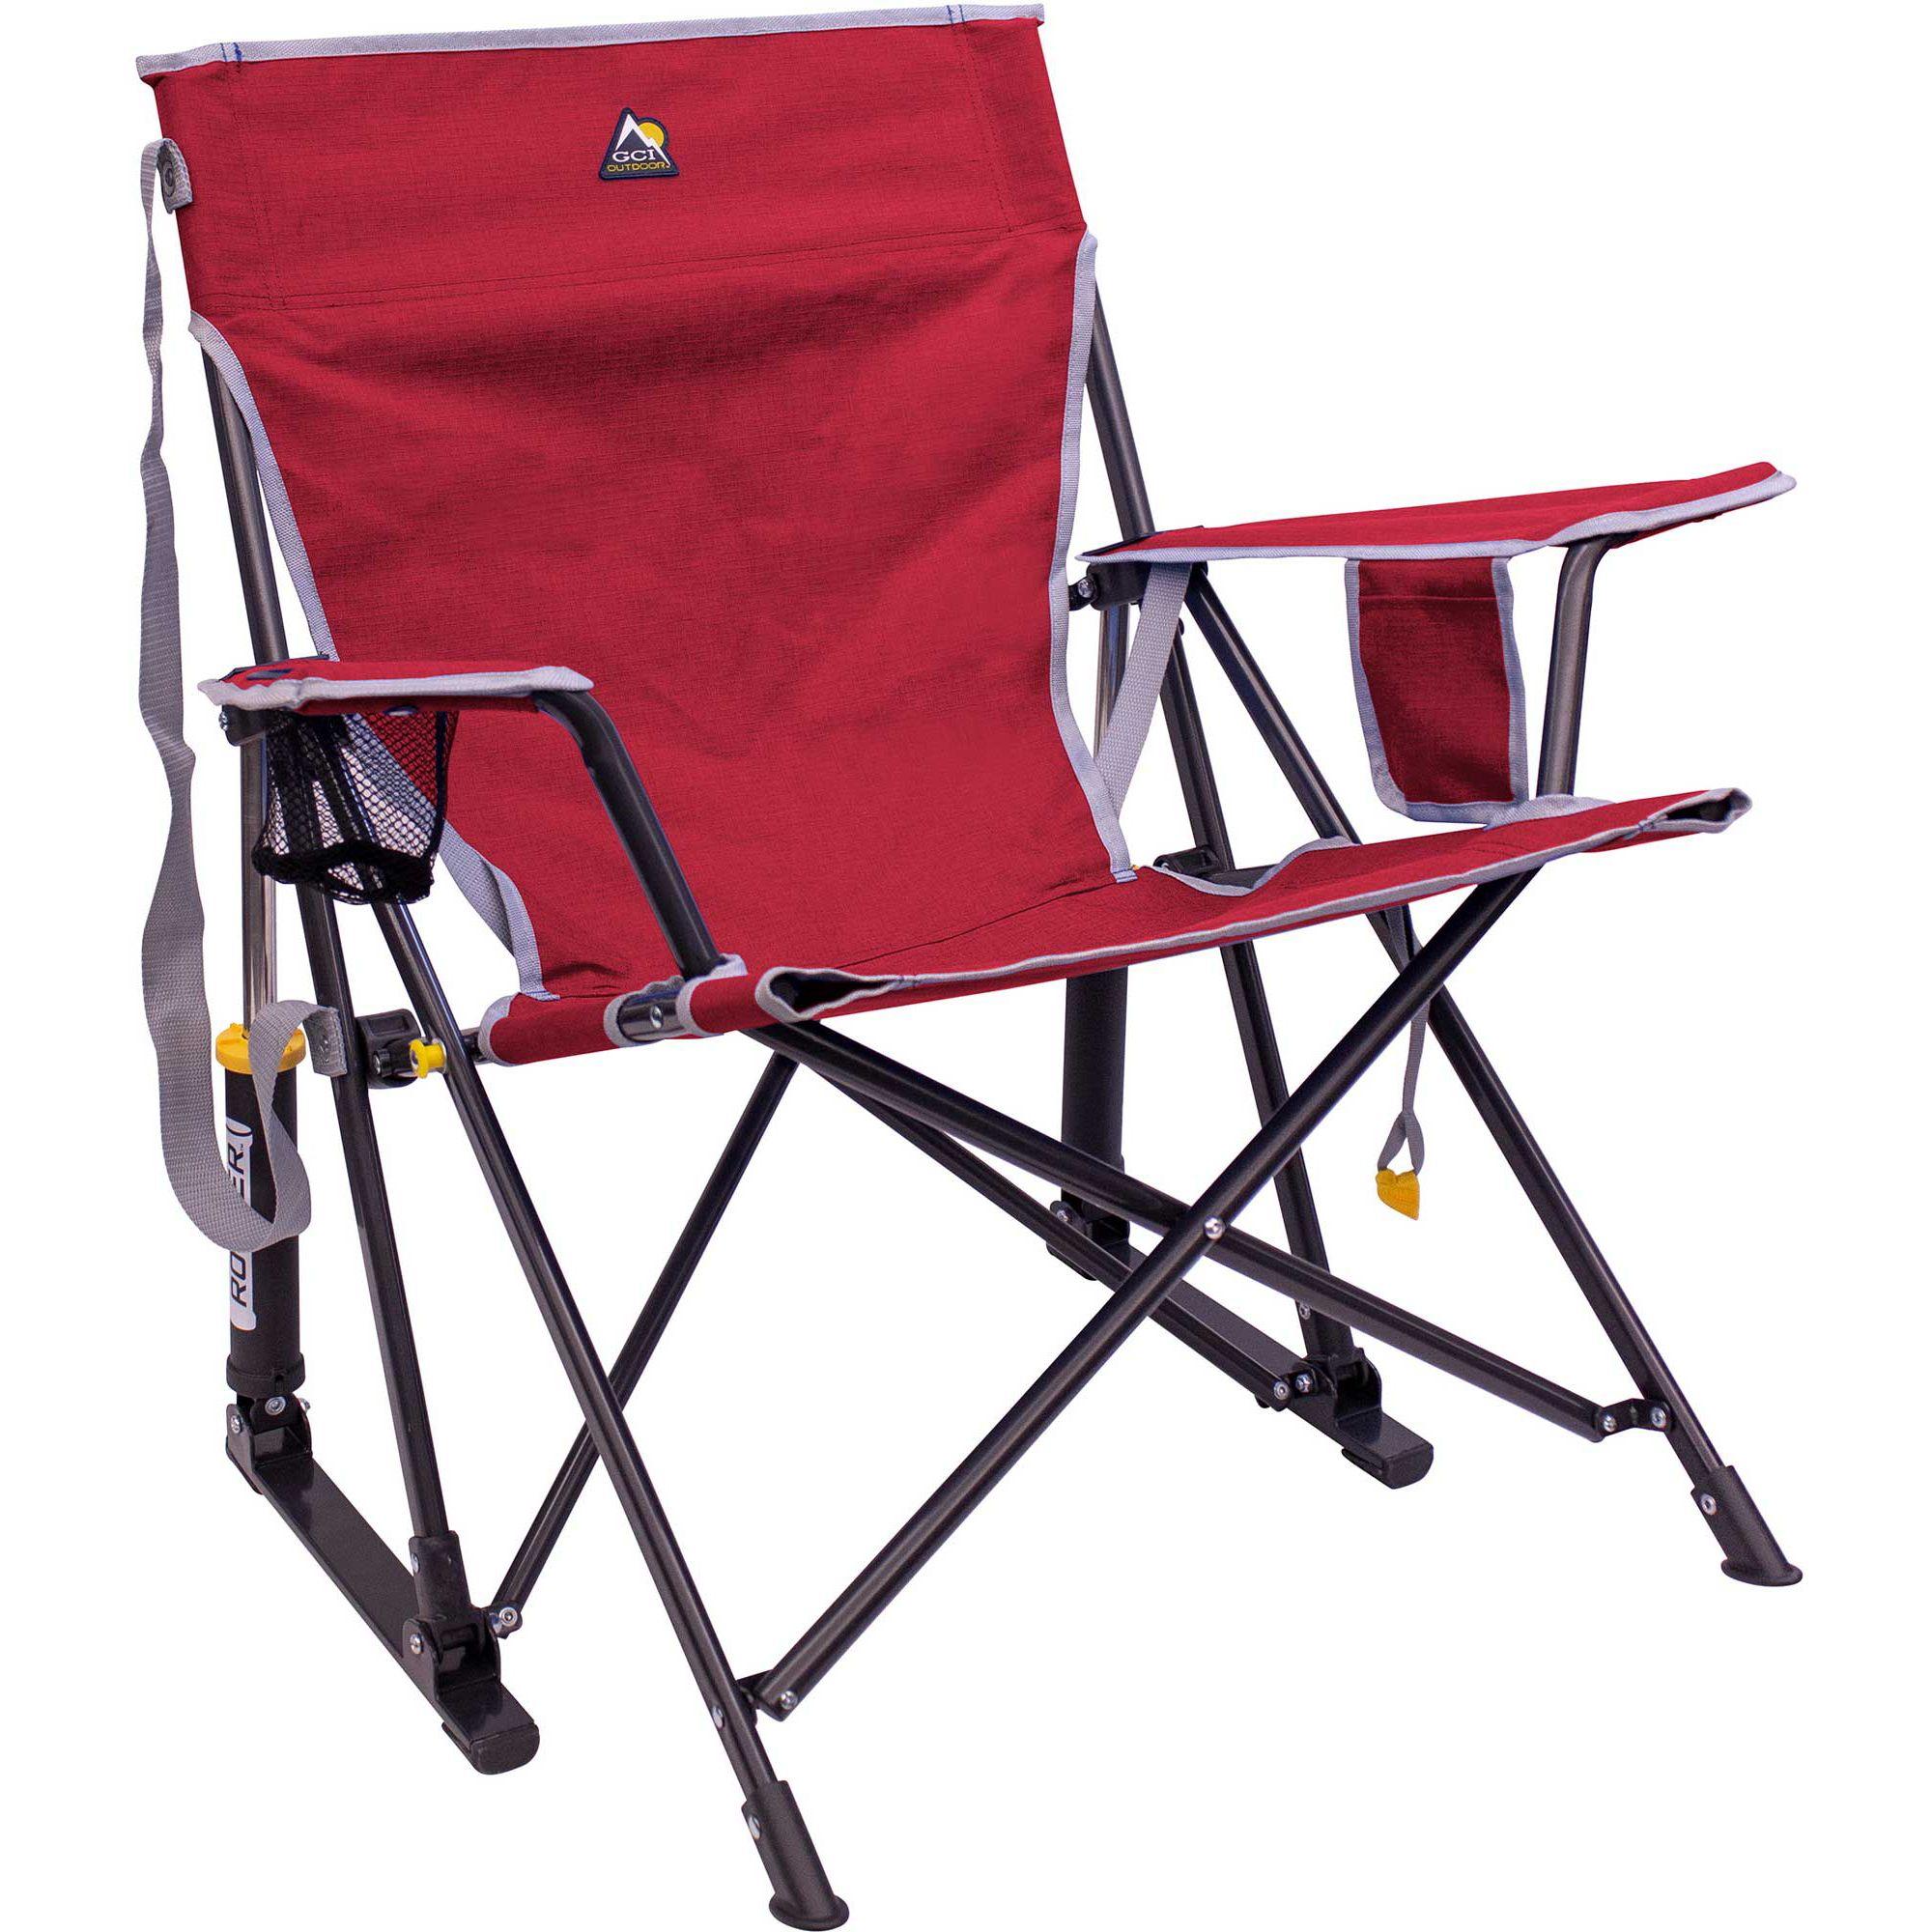 GCI Outdoor Kickback Rocker - Great gift idea for outdoor enthusiast.